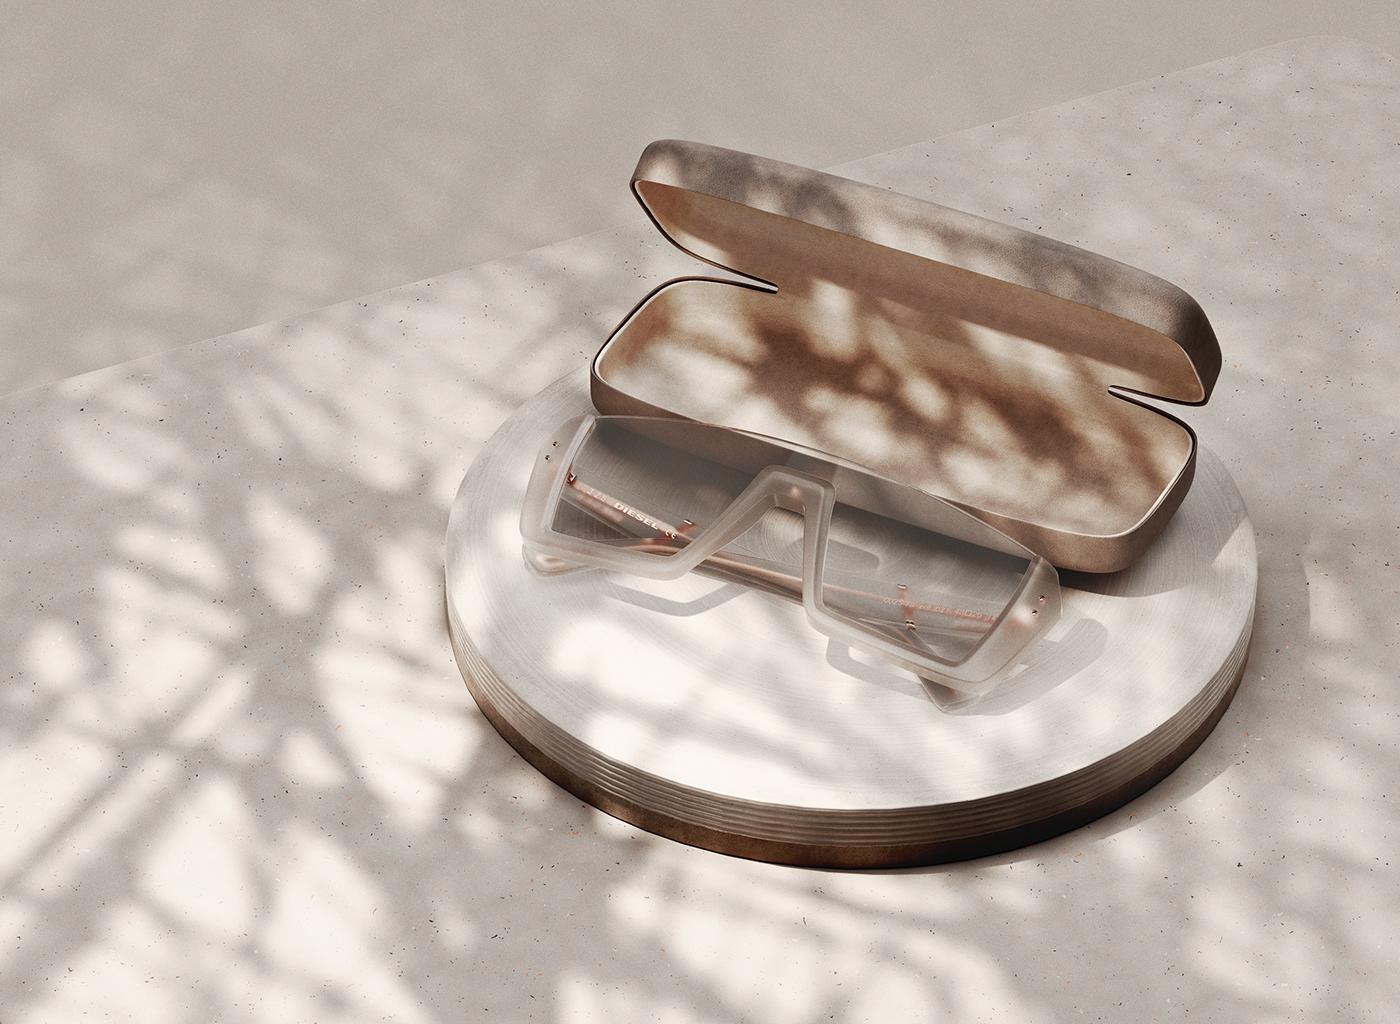 Diesel elia eyewear glasses lens PADOVA pirazzo product sketch Sunglasses